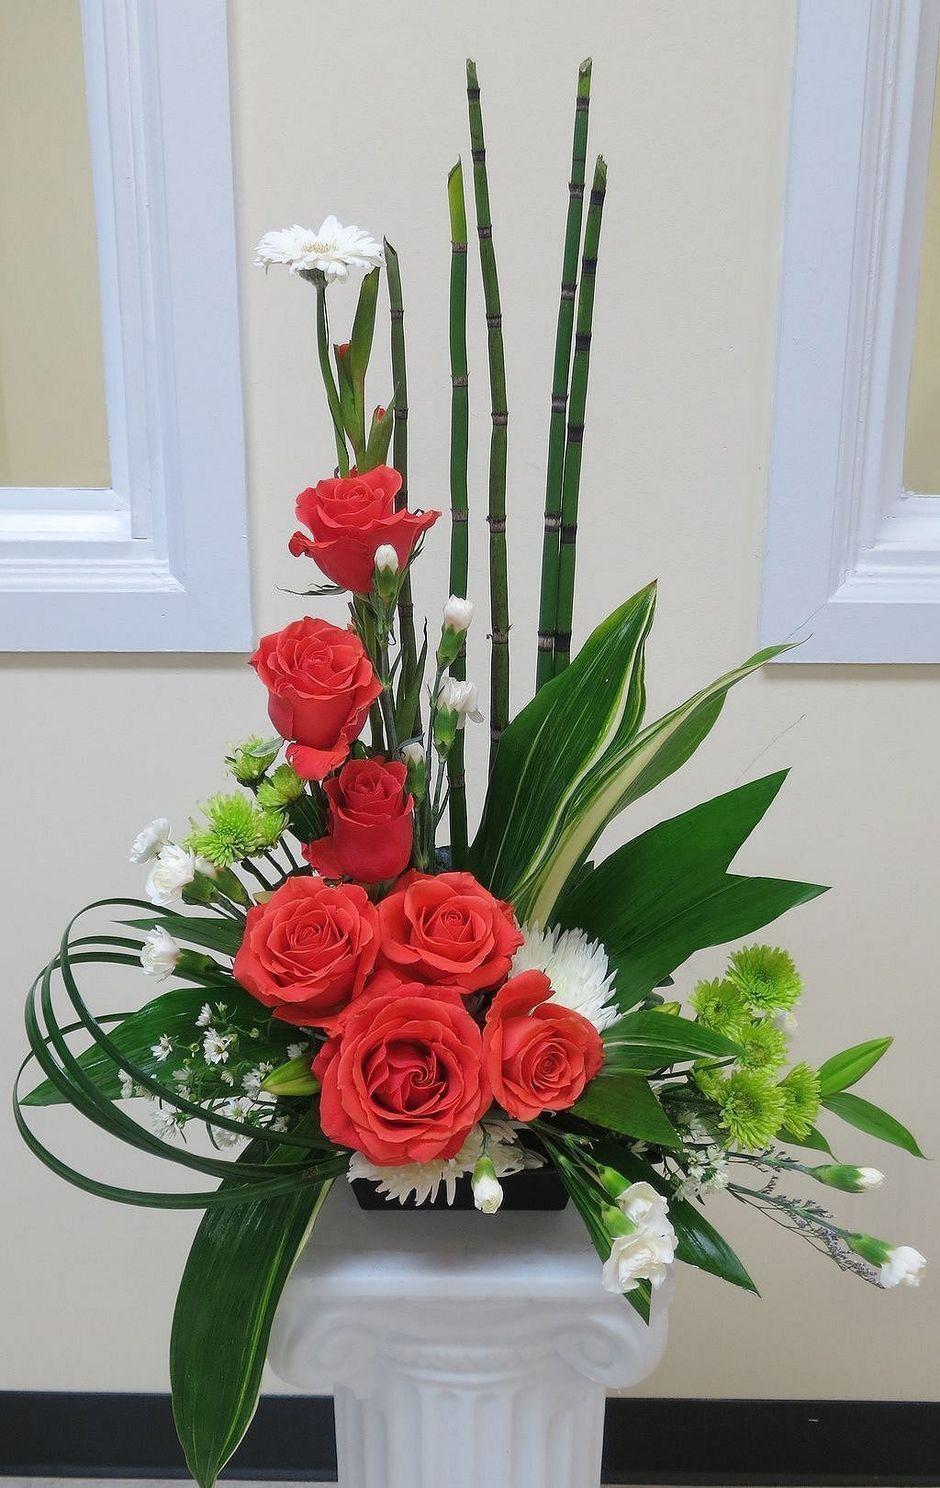 100 Beauty Spring Flowers Arrangements Centerpieces Ideas 9 Spring